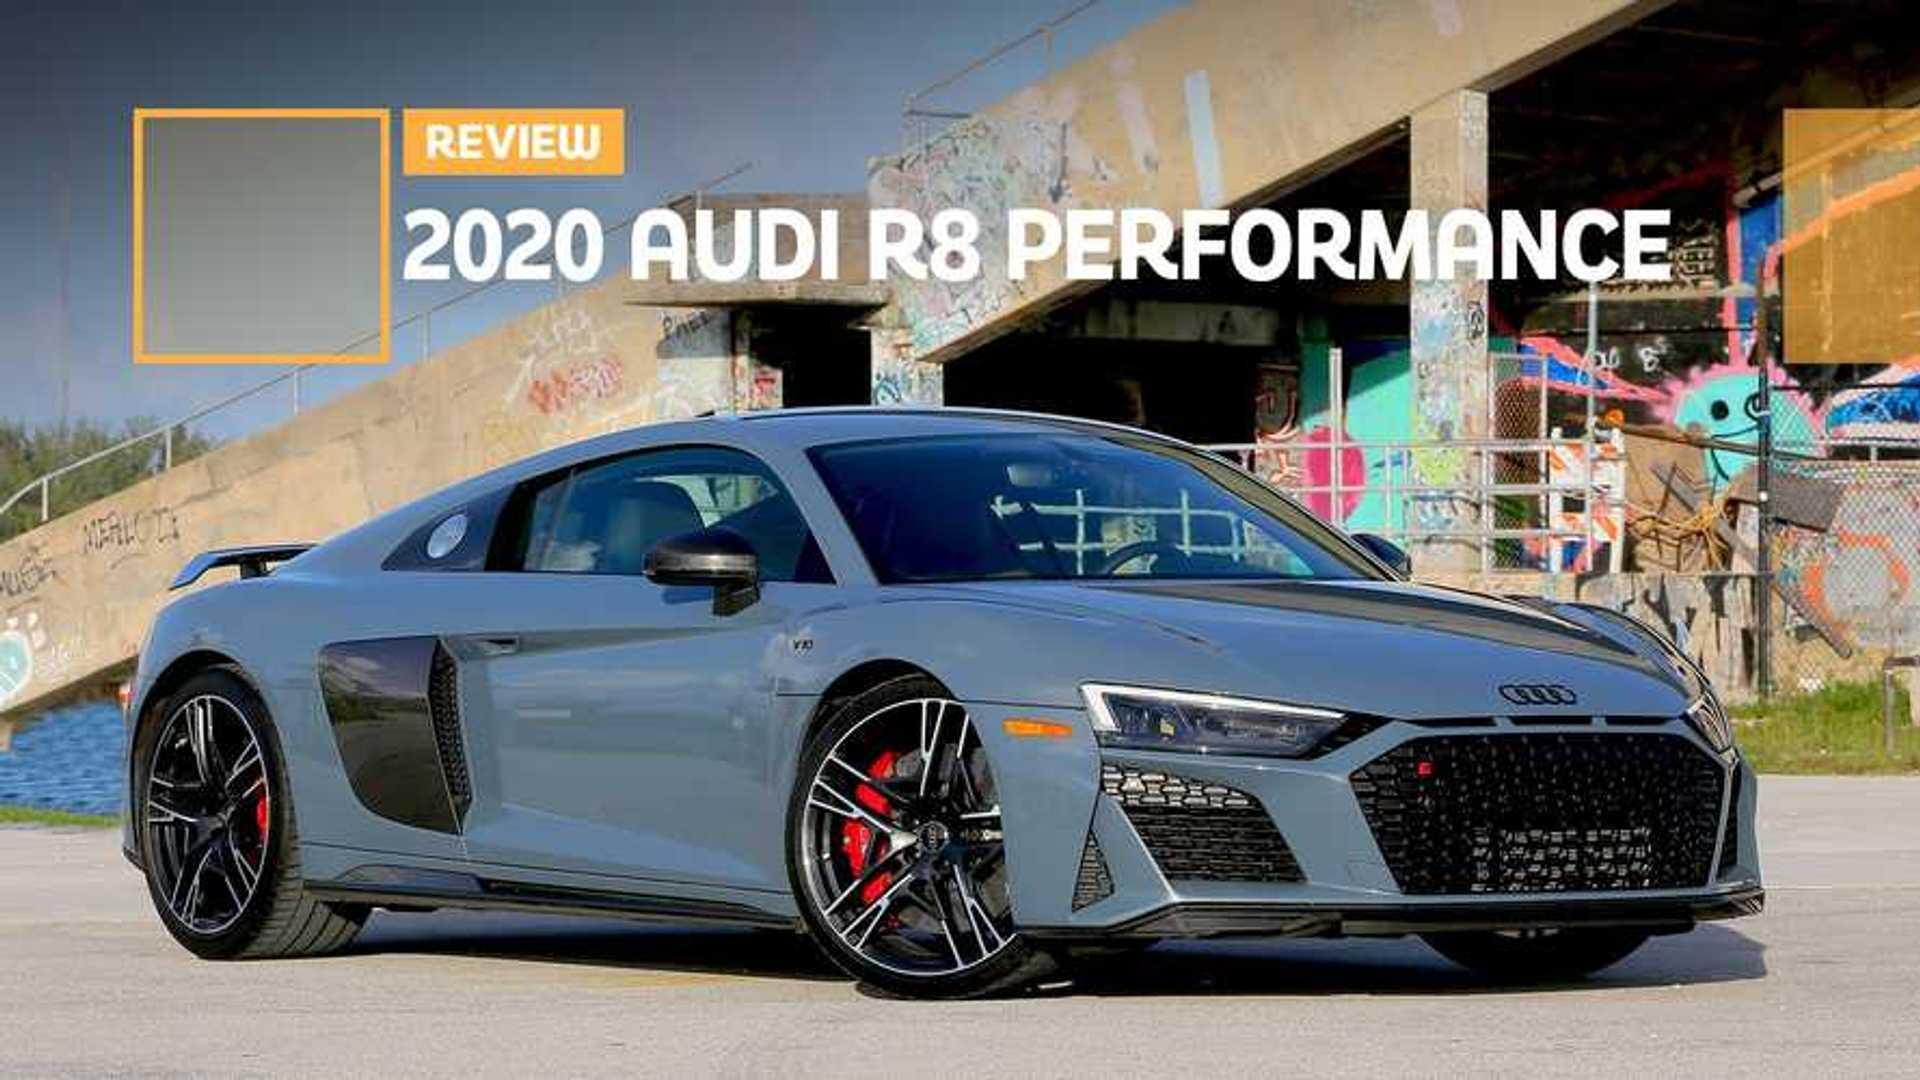 2020 Audi R8 Performance Review: Better Car, Best Engine